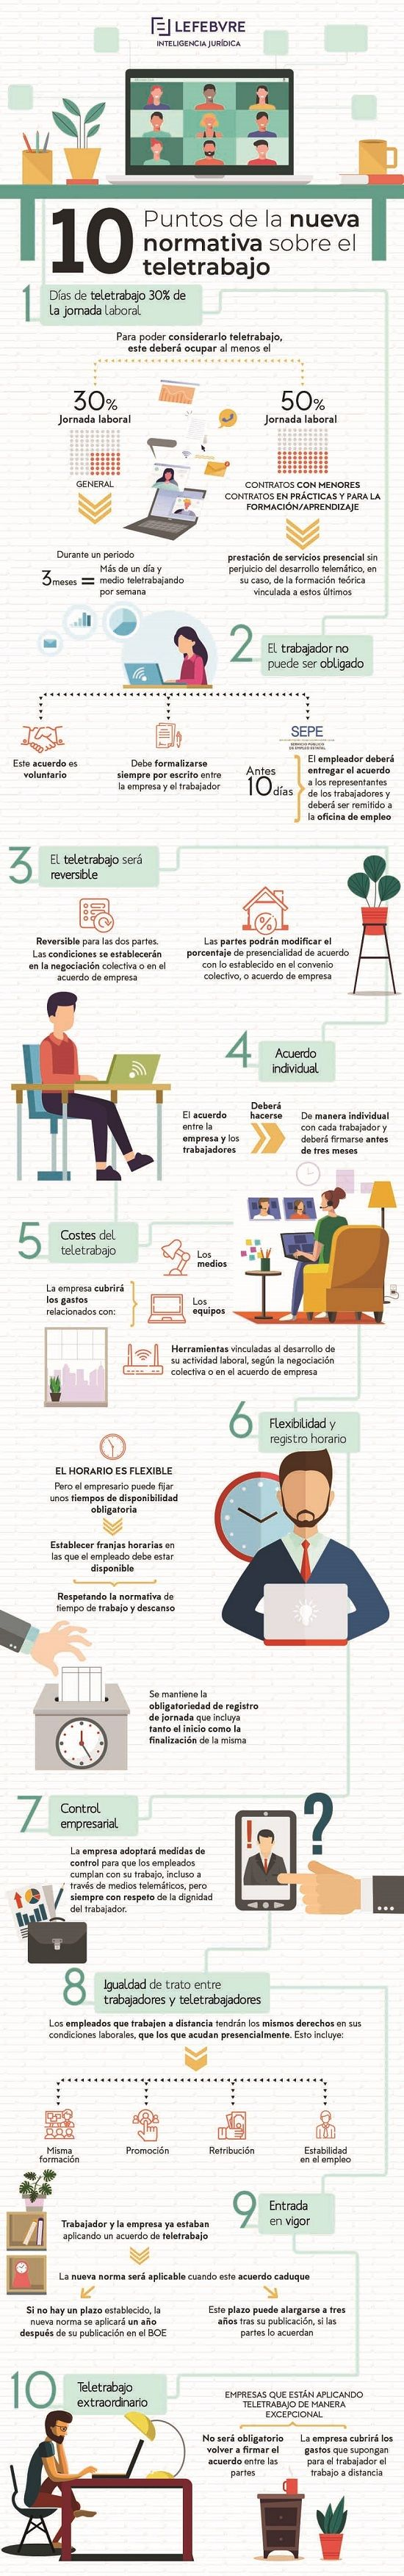 Fotografia Infografía Lefebvre Teletrabajo